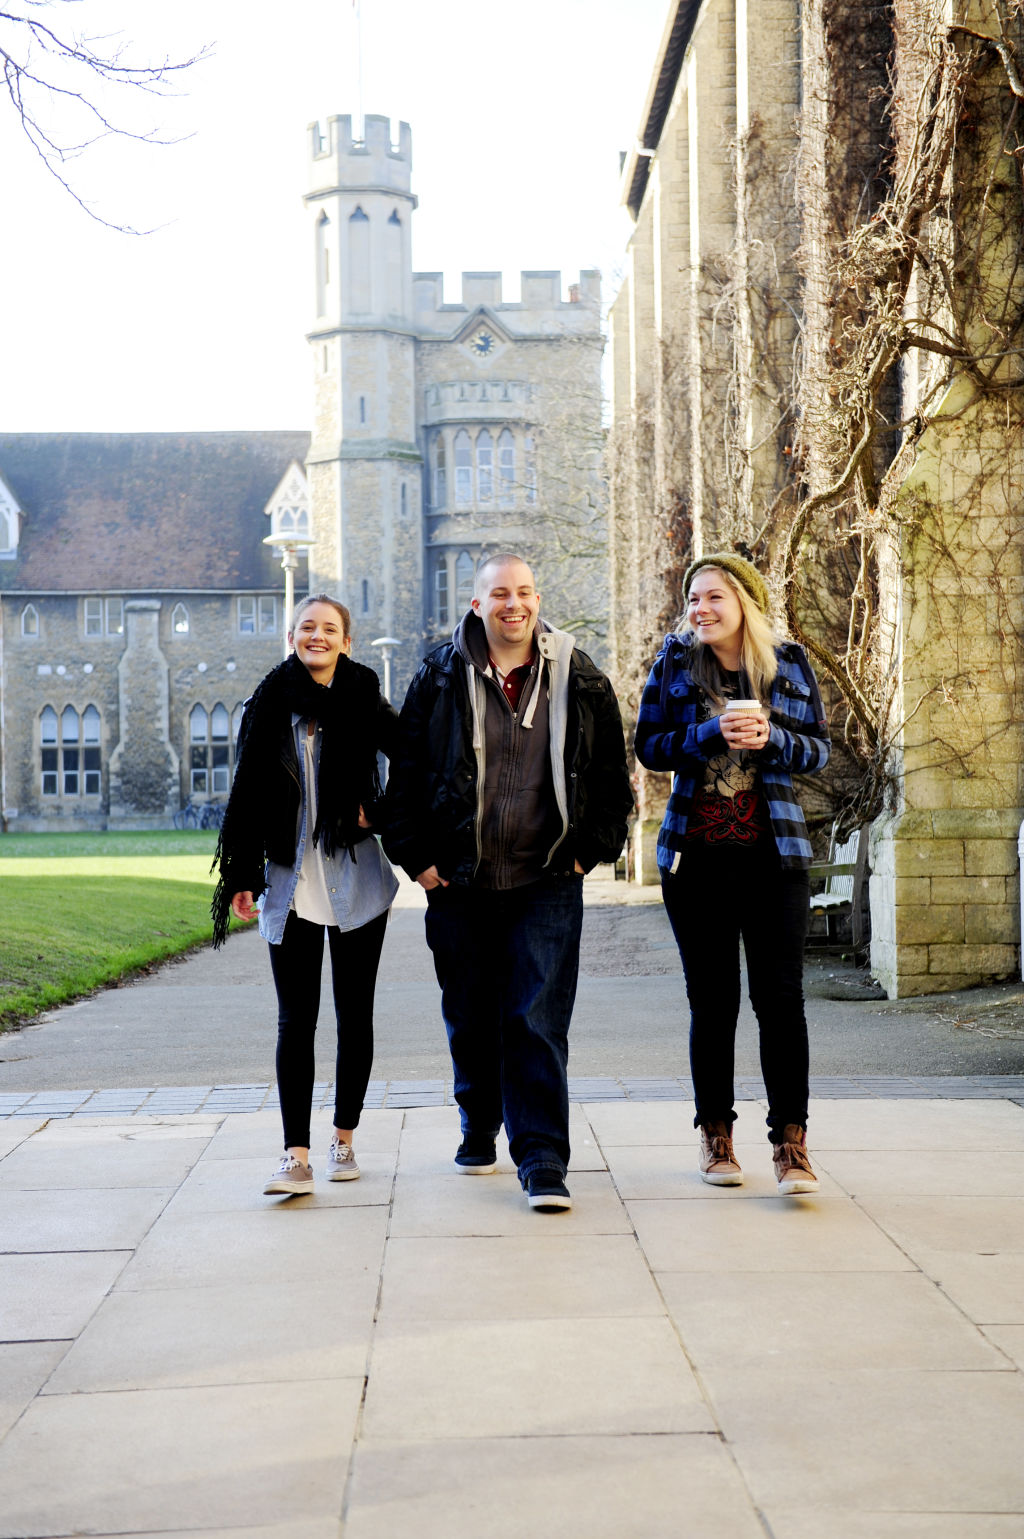 Students walking through University of Gloucestershire campus